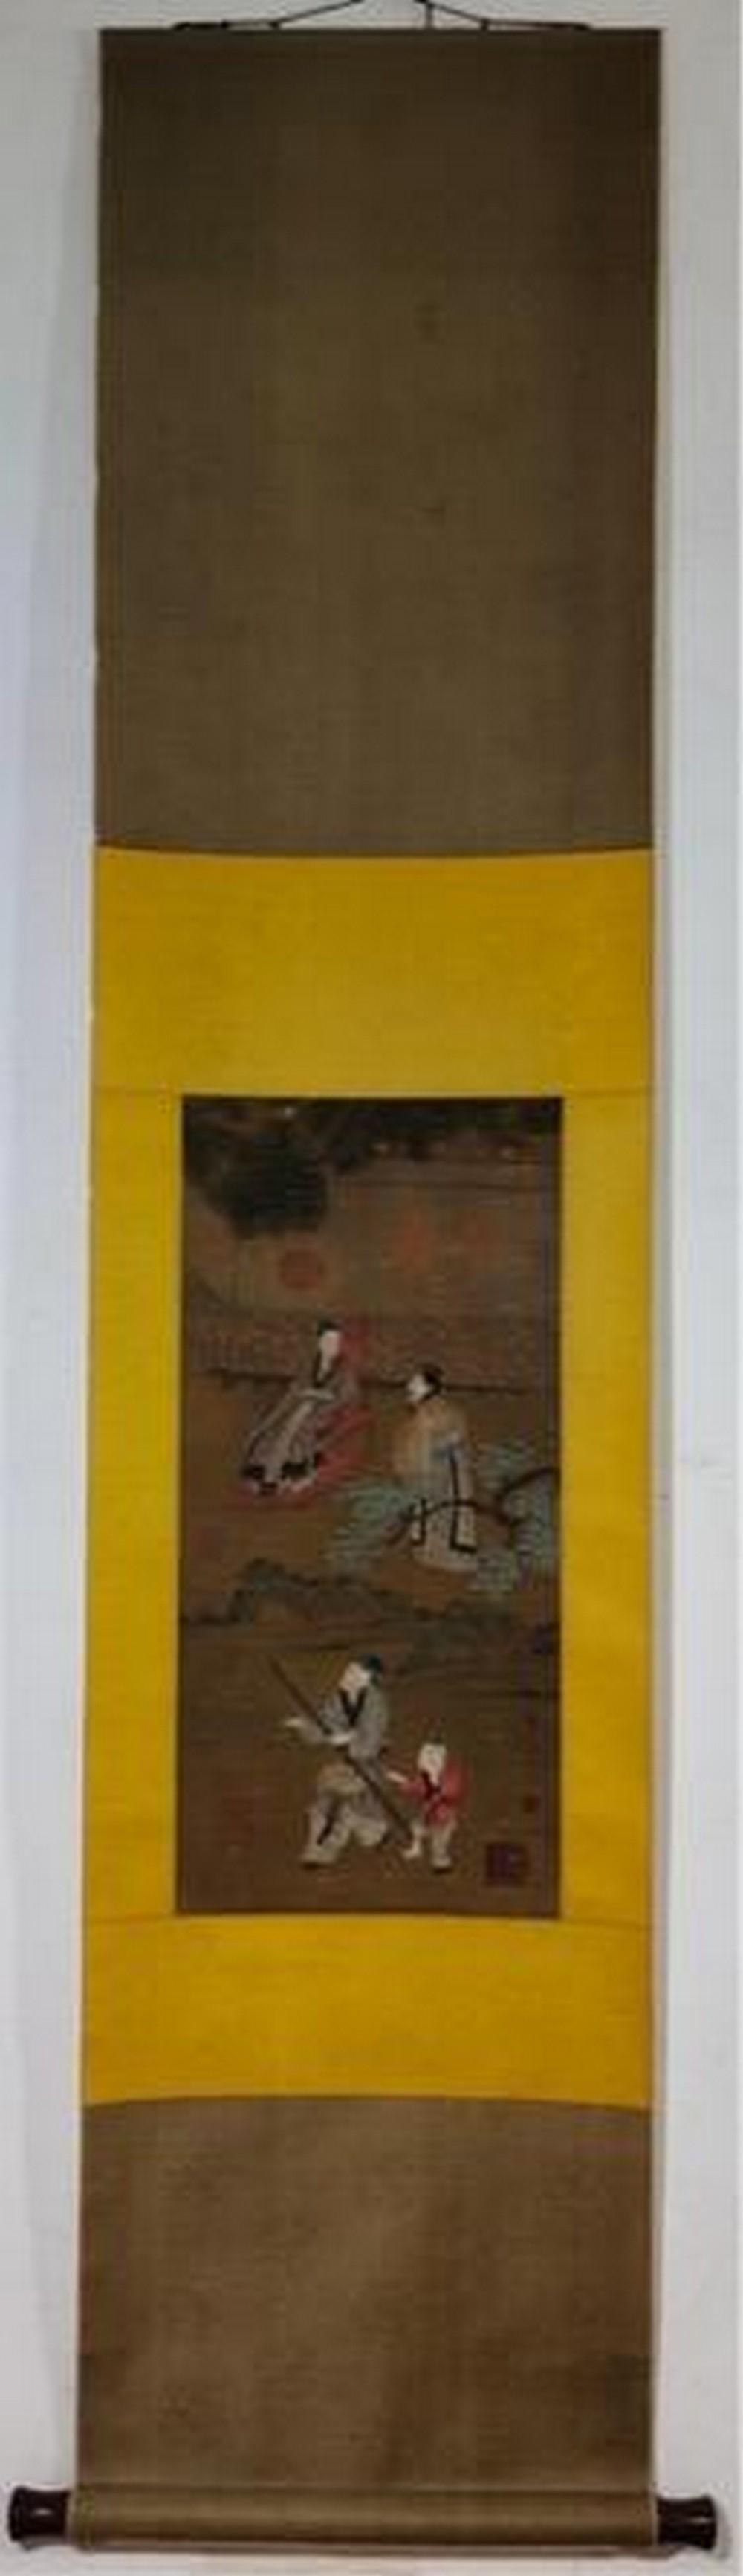 Story silk scroll by Qiu Ying